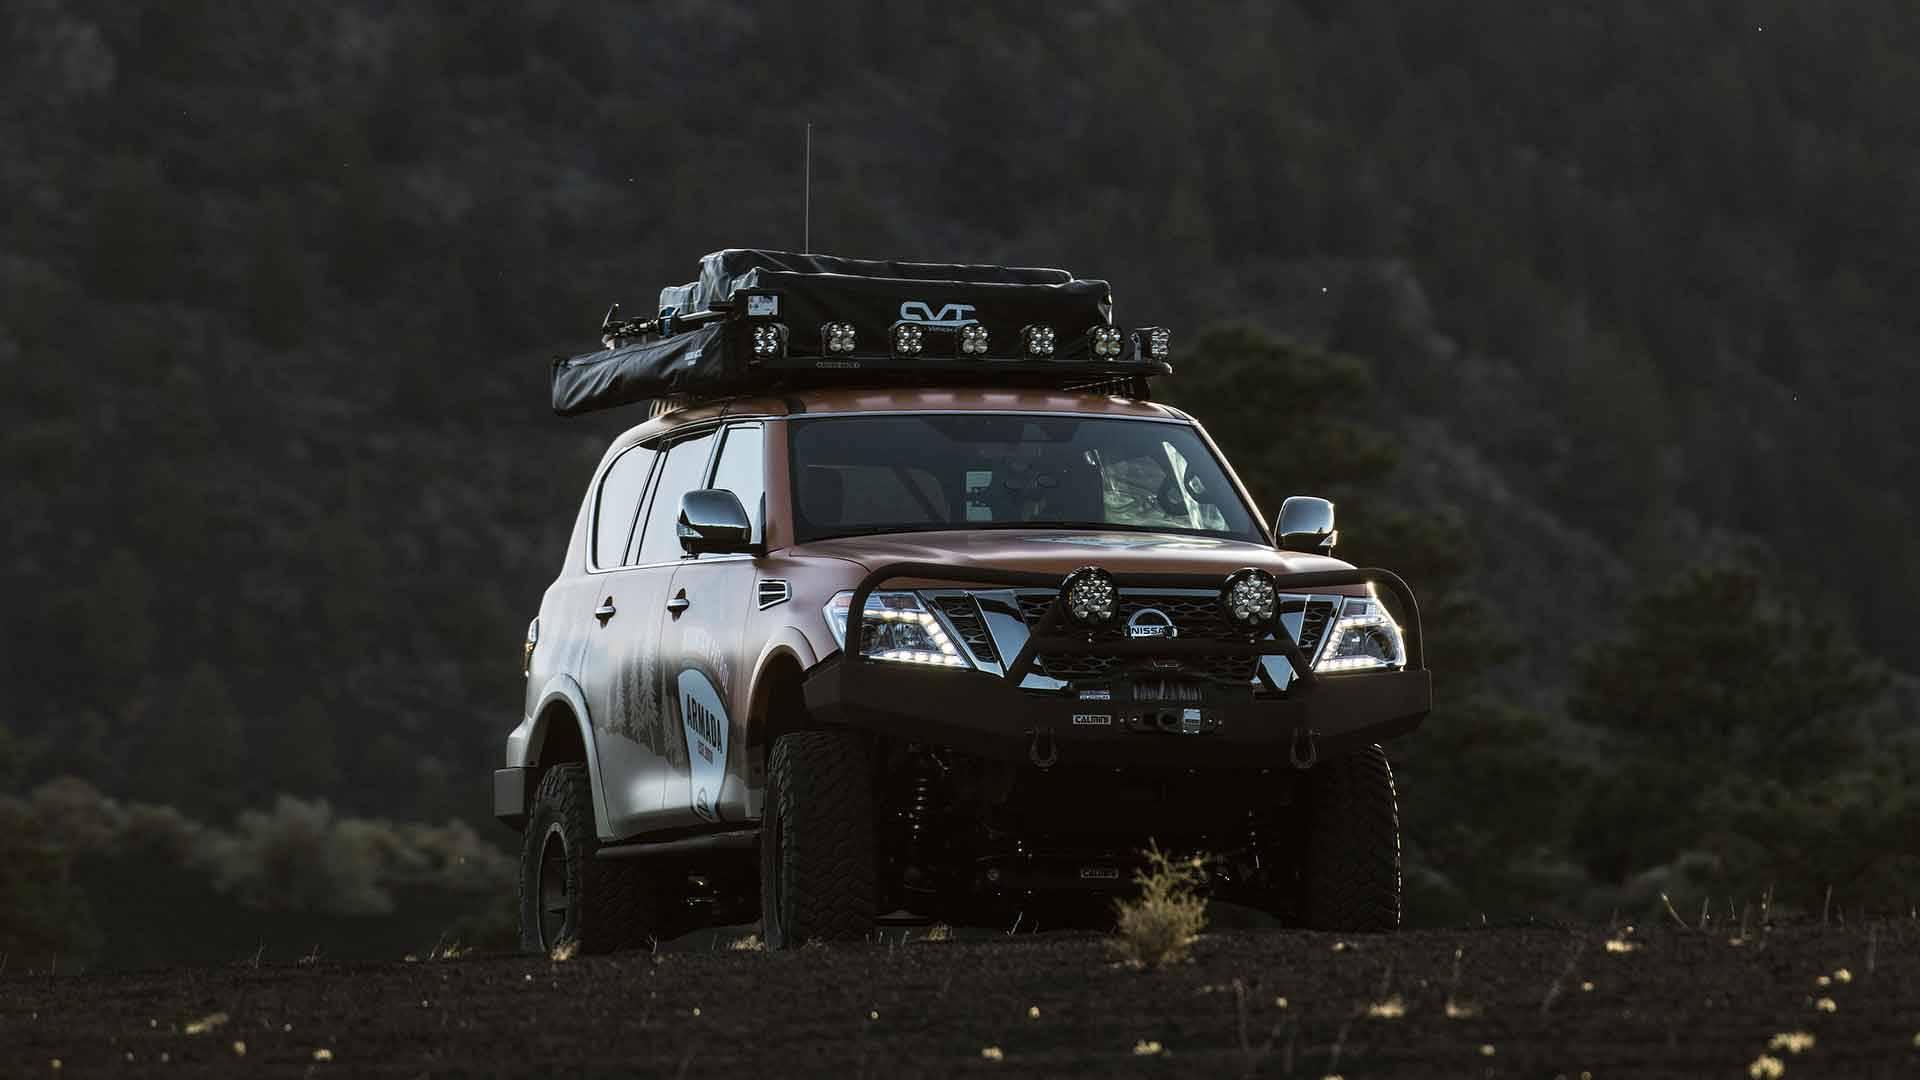 Nett Nissans Patrouillenschaltplan Ideen - Elektrische Schaltplan ...